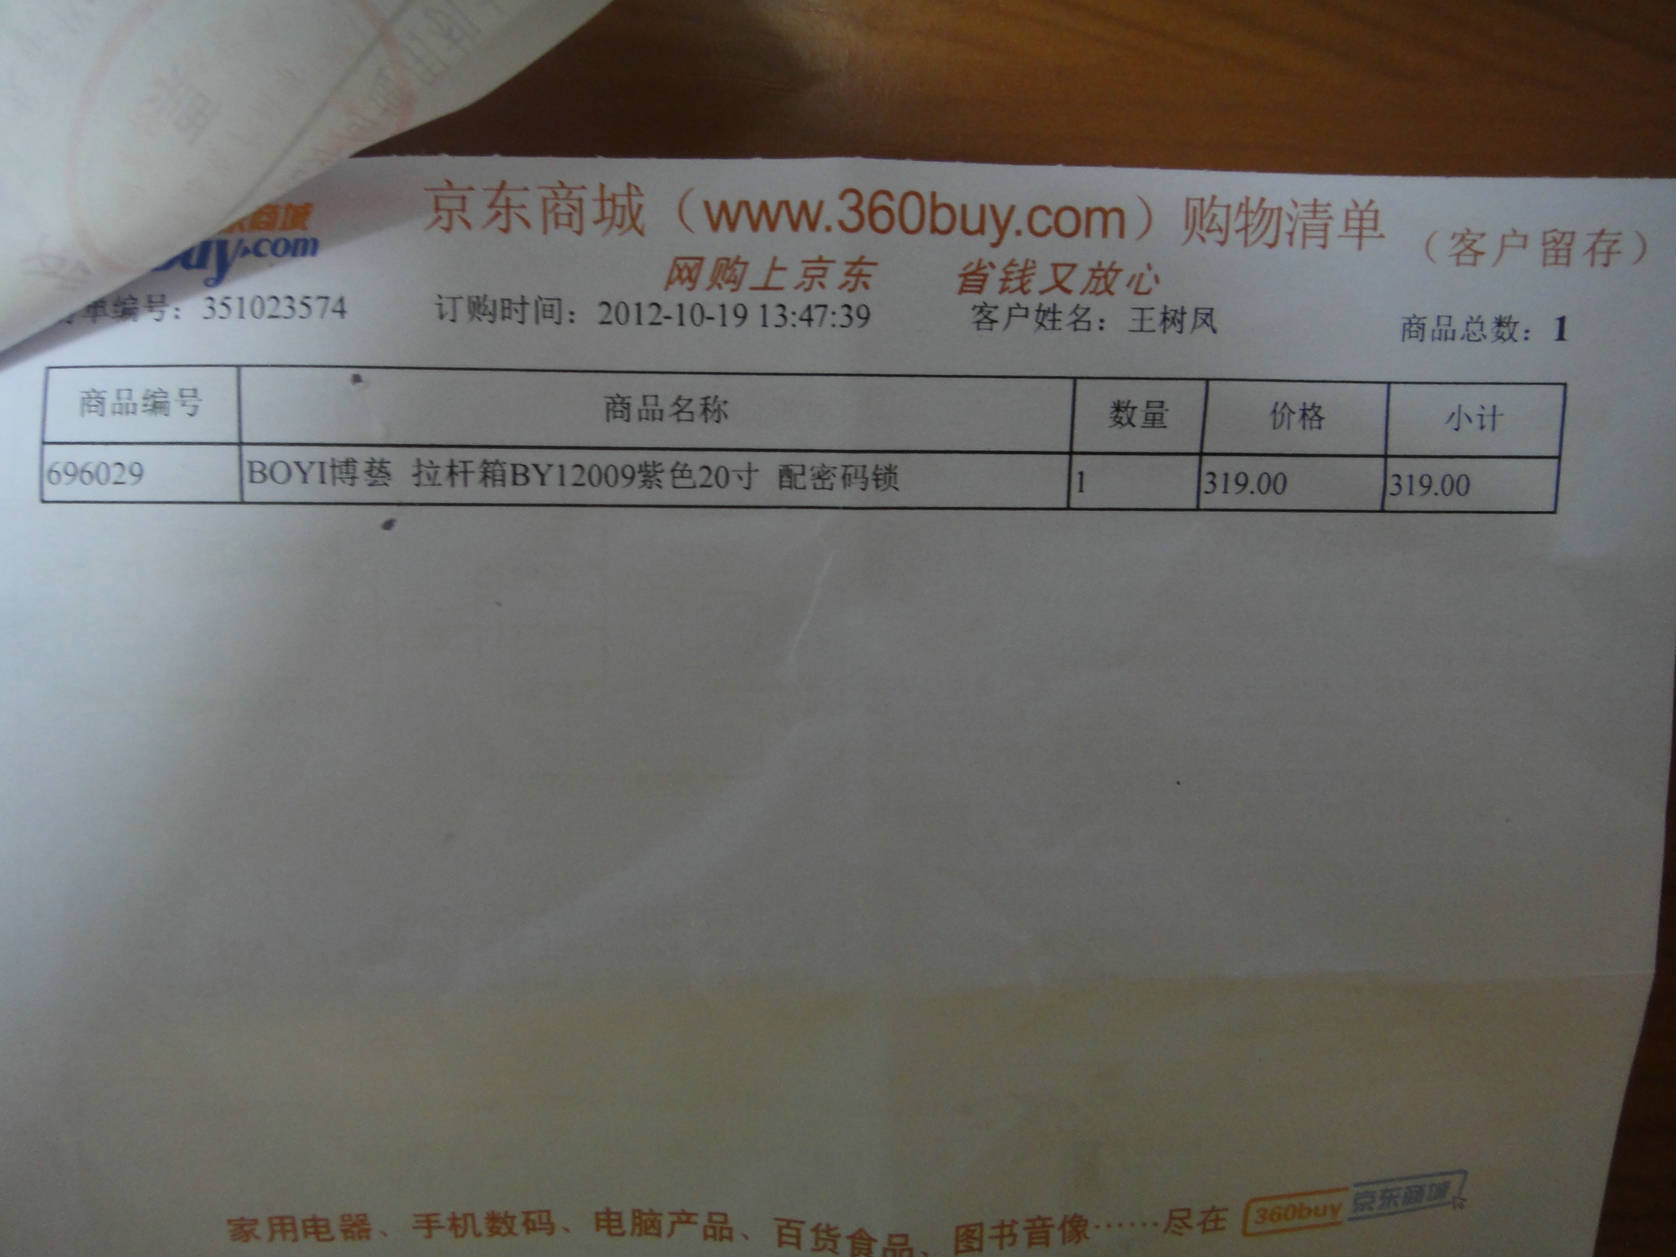 michael kors outlet sale online 00256816 for-cheap